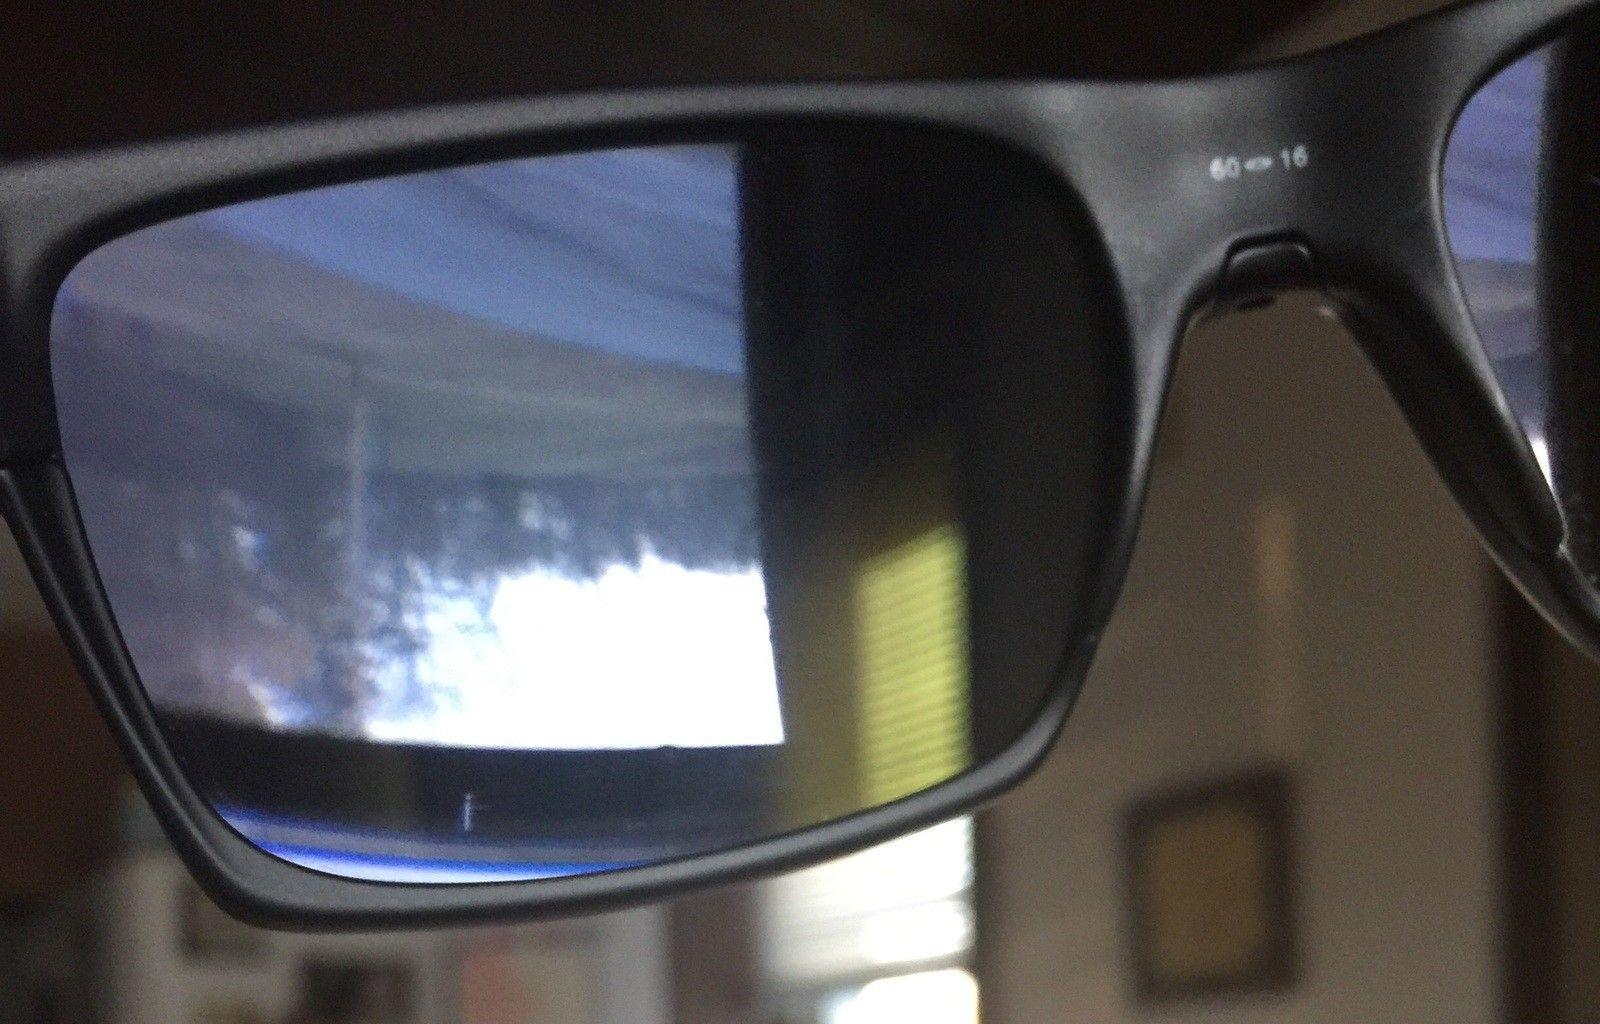 Chainlink Ferrari Lenses, & SI Gascan  (TwoFace & Chainlink frame sold) - image.jpg